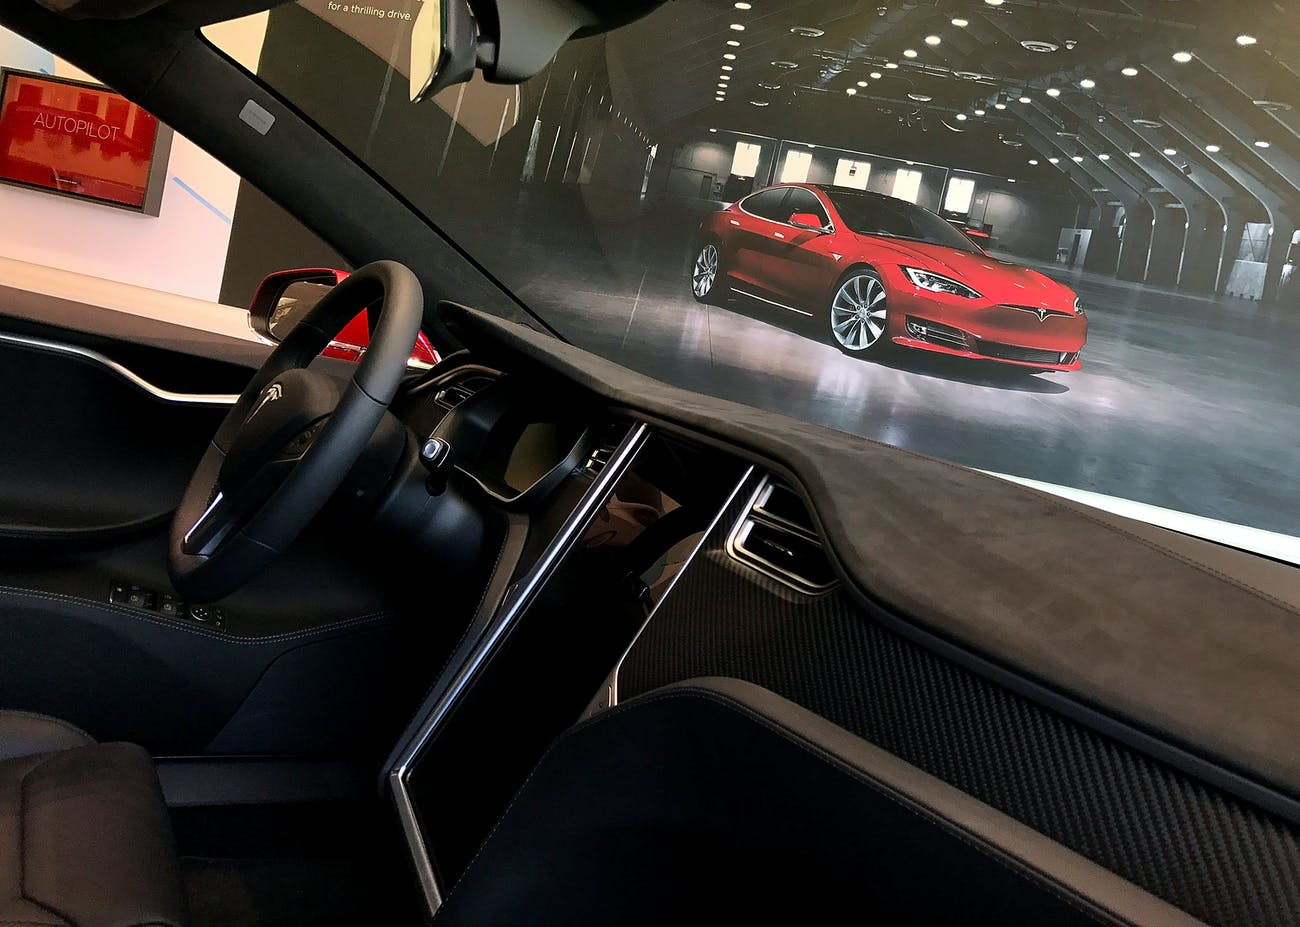 A Tesla Model S electric vehicle.